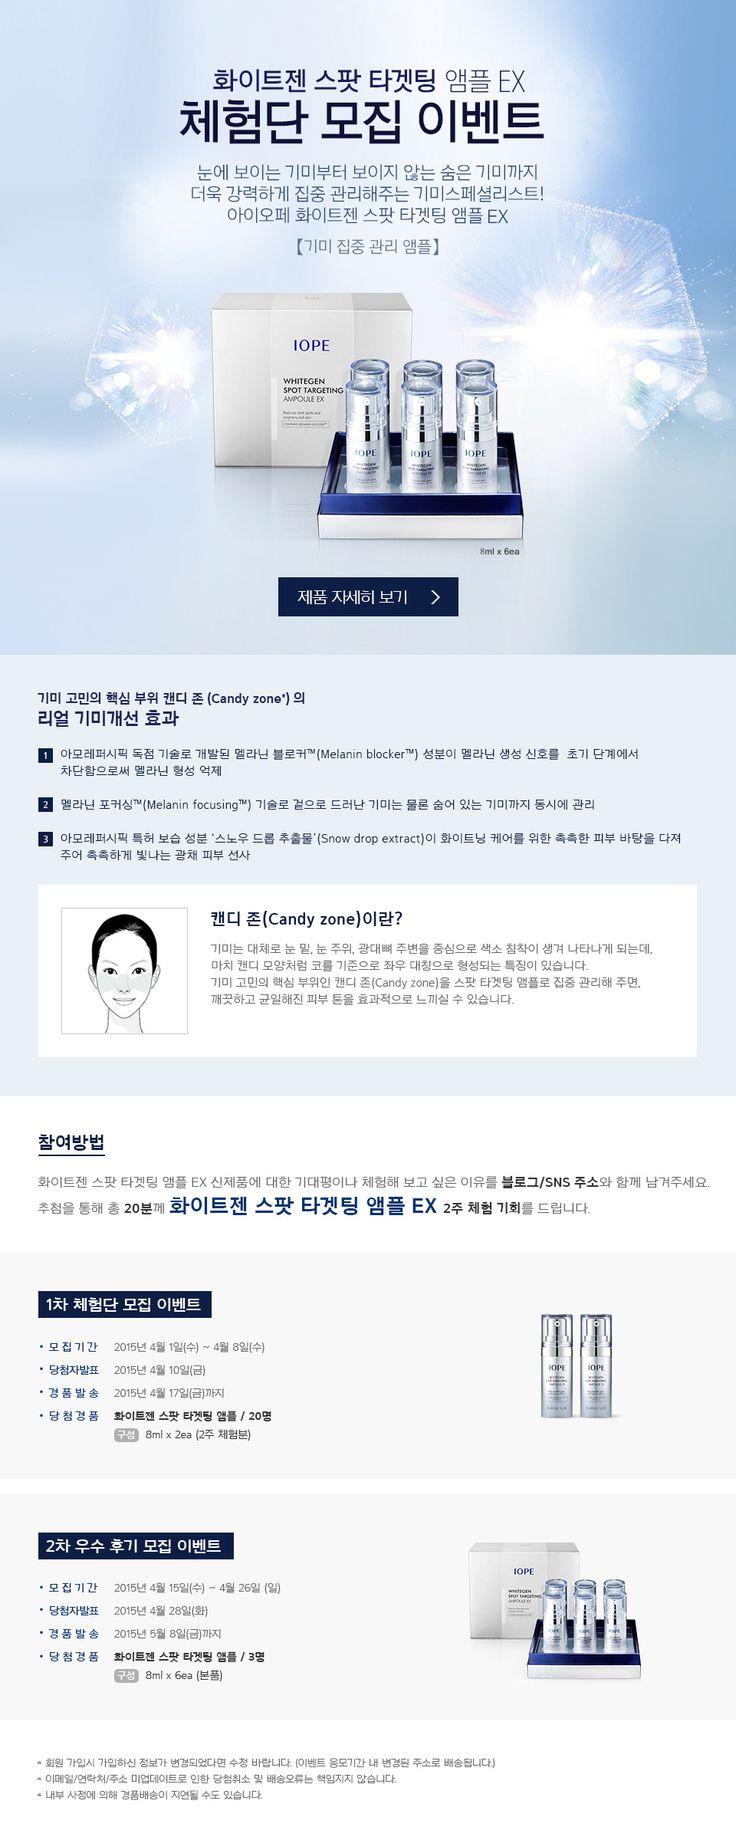 NEW 아이오페 화이트젠 스팟 타겟팅 앰플 EX 체험단 모집 이벤트